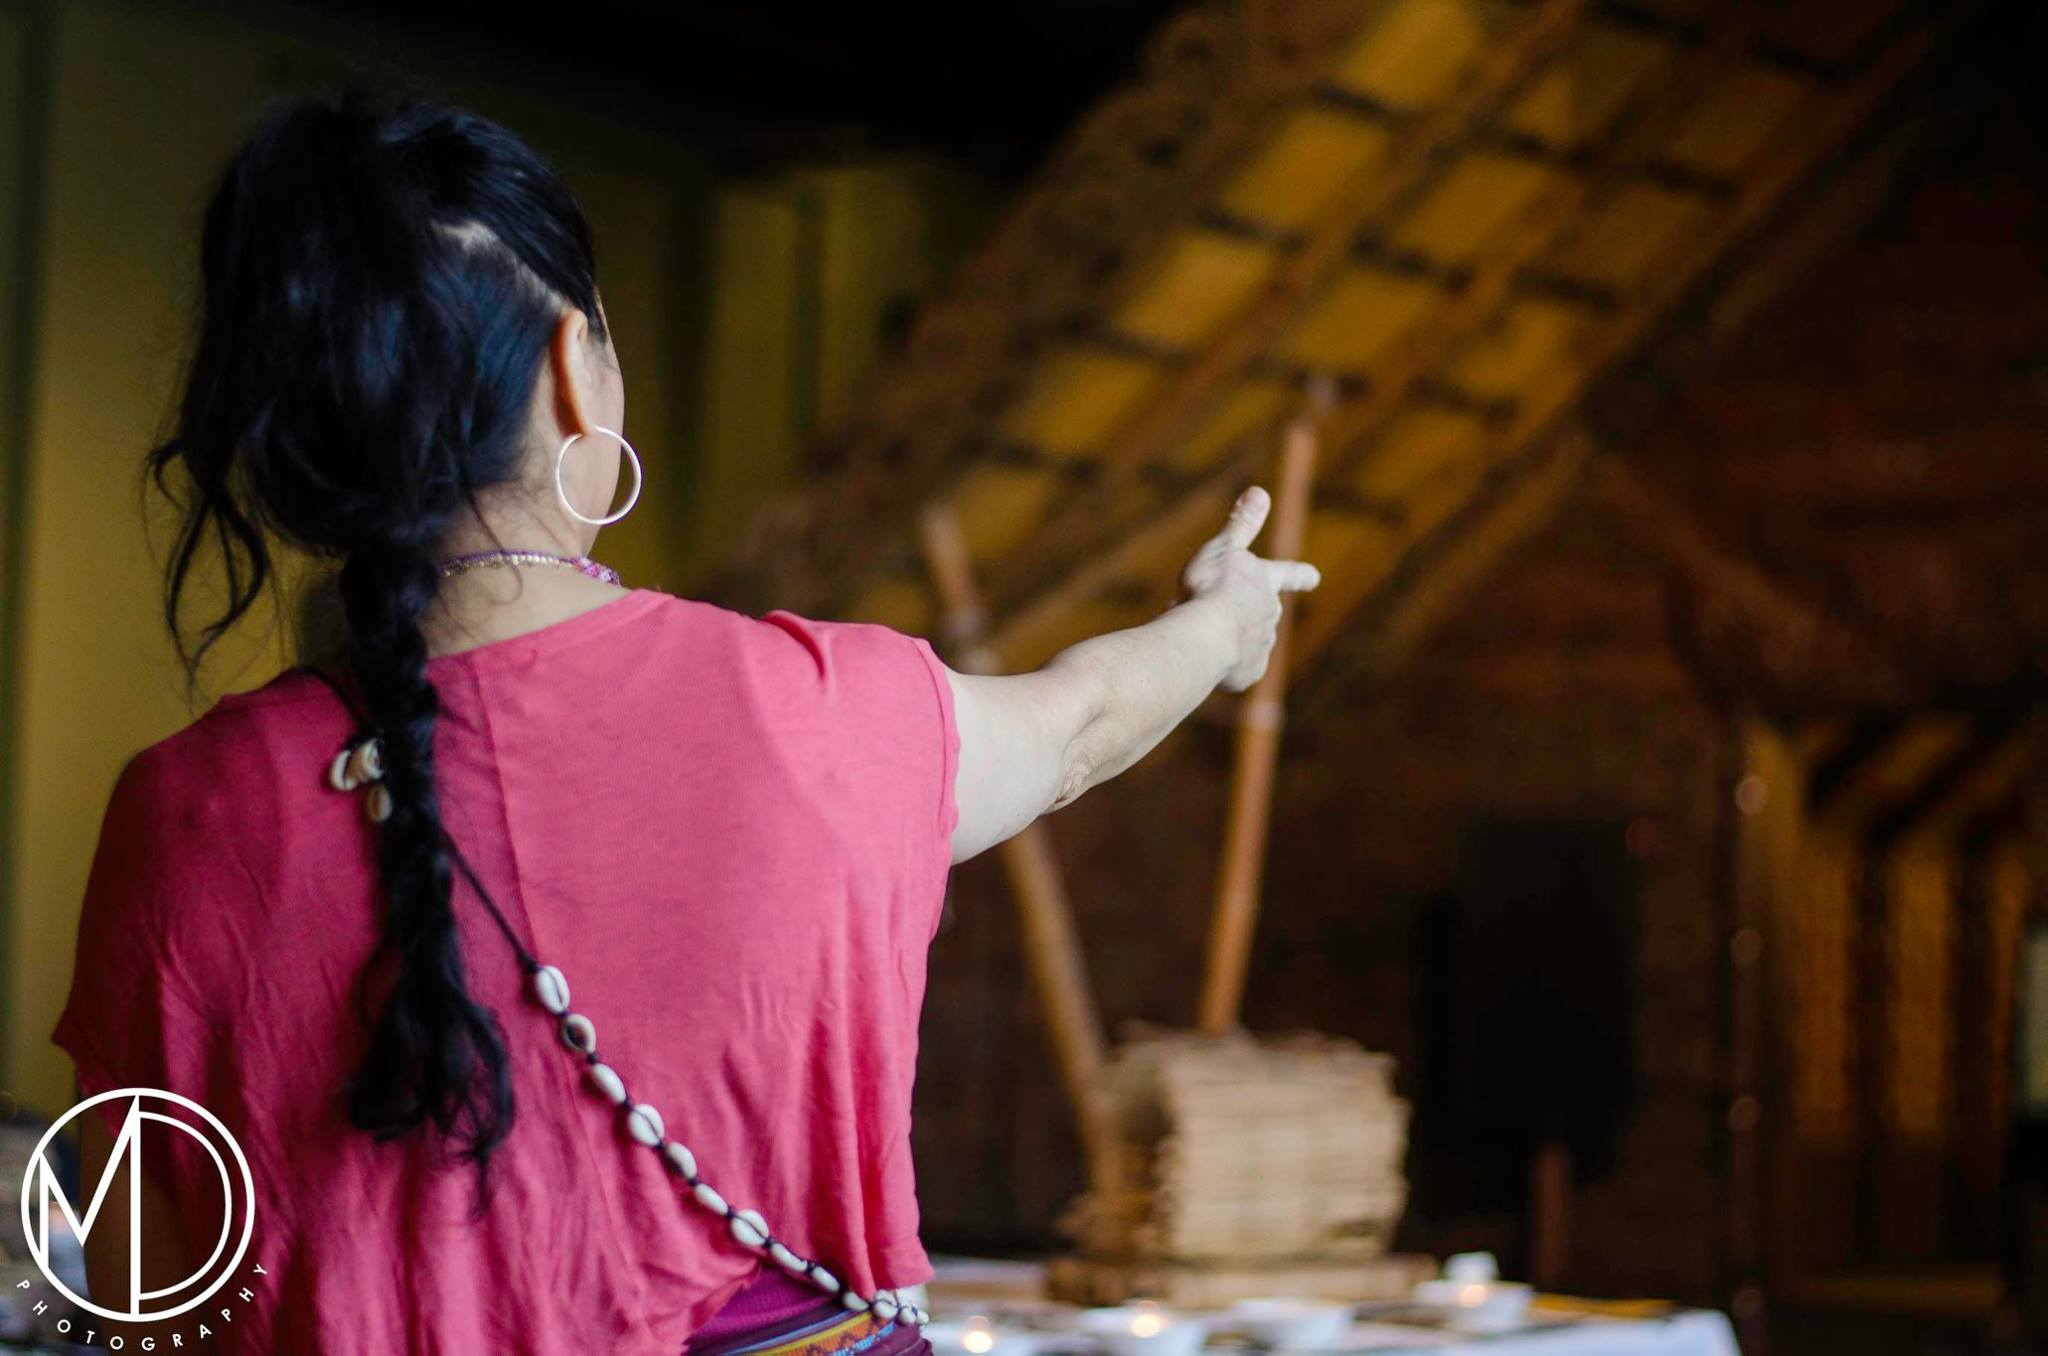 Co-host Irene Juaniza addressing the Maori House.